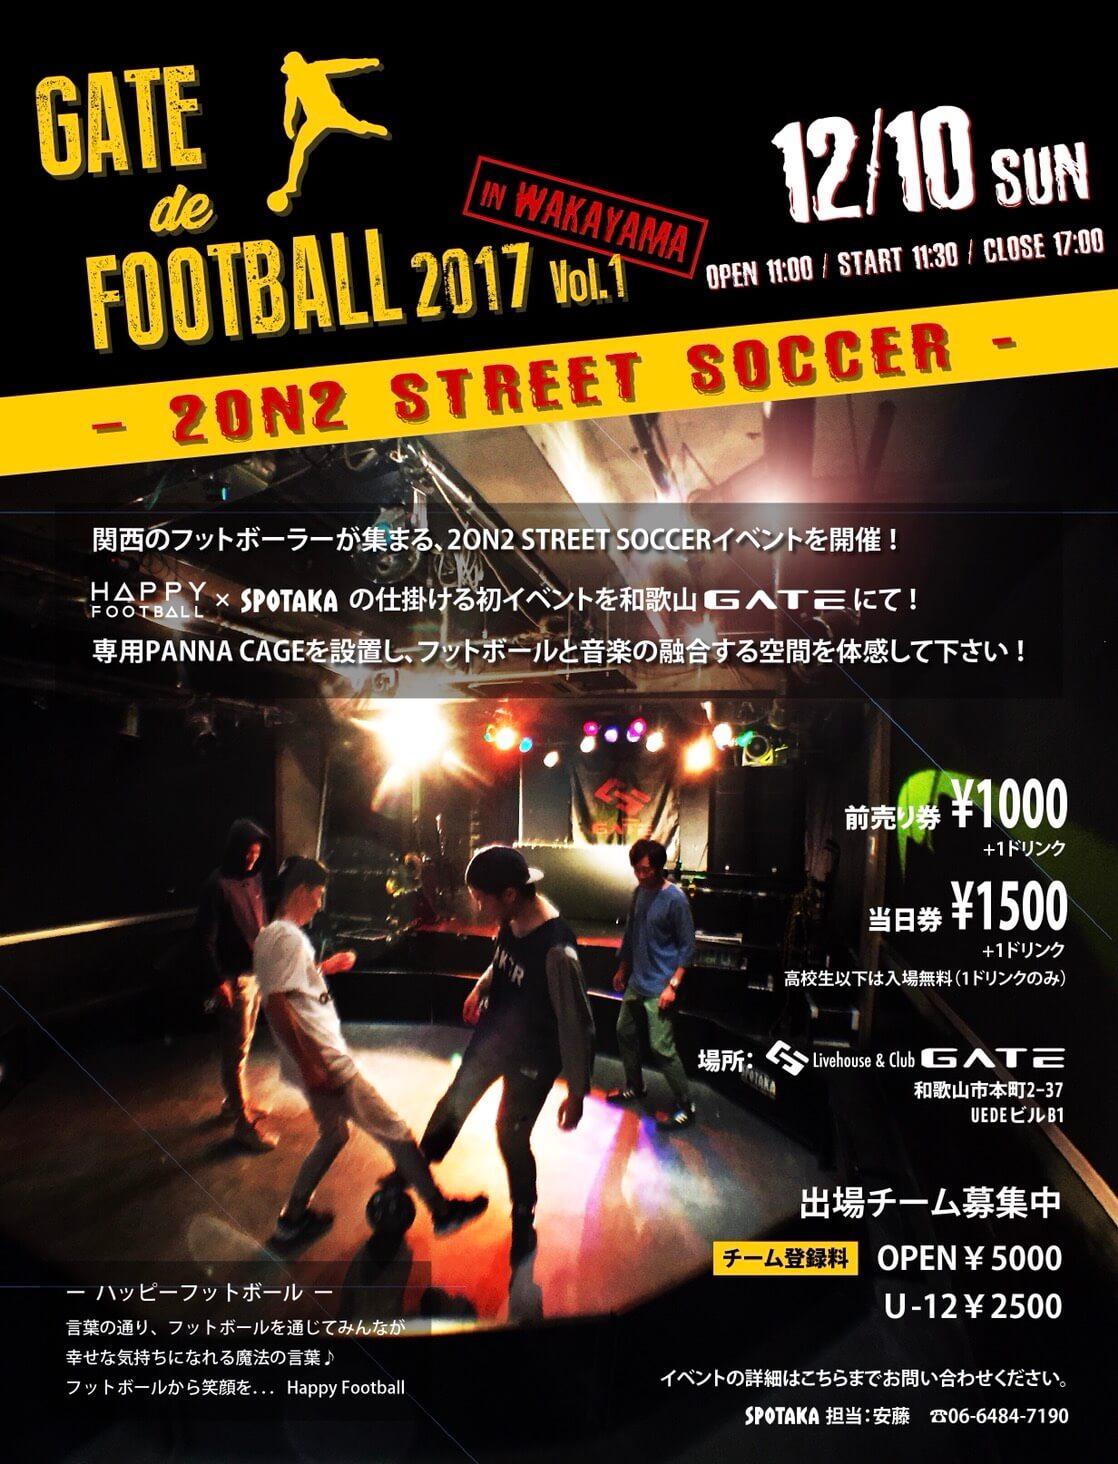 GATE de  FOOTBALL!!